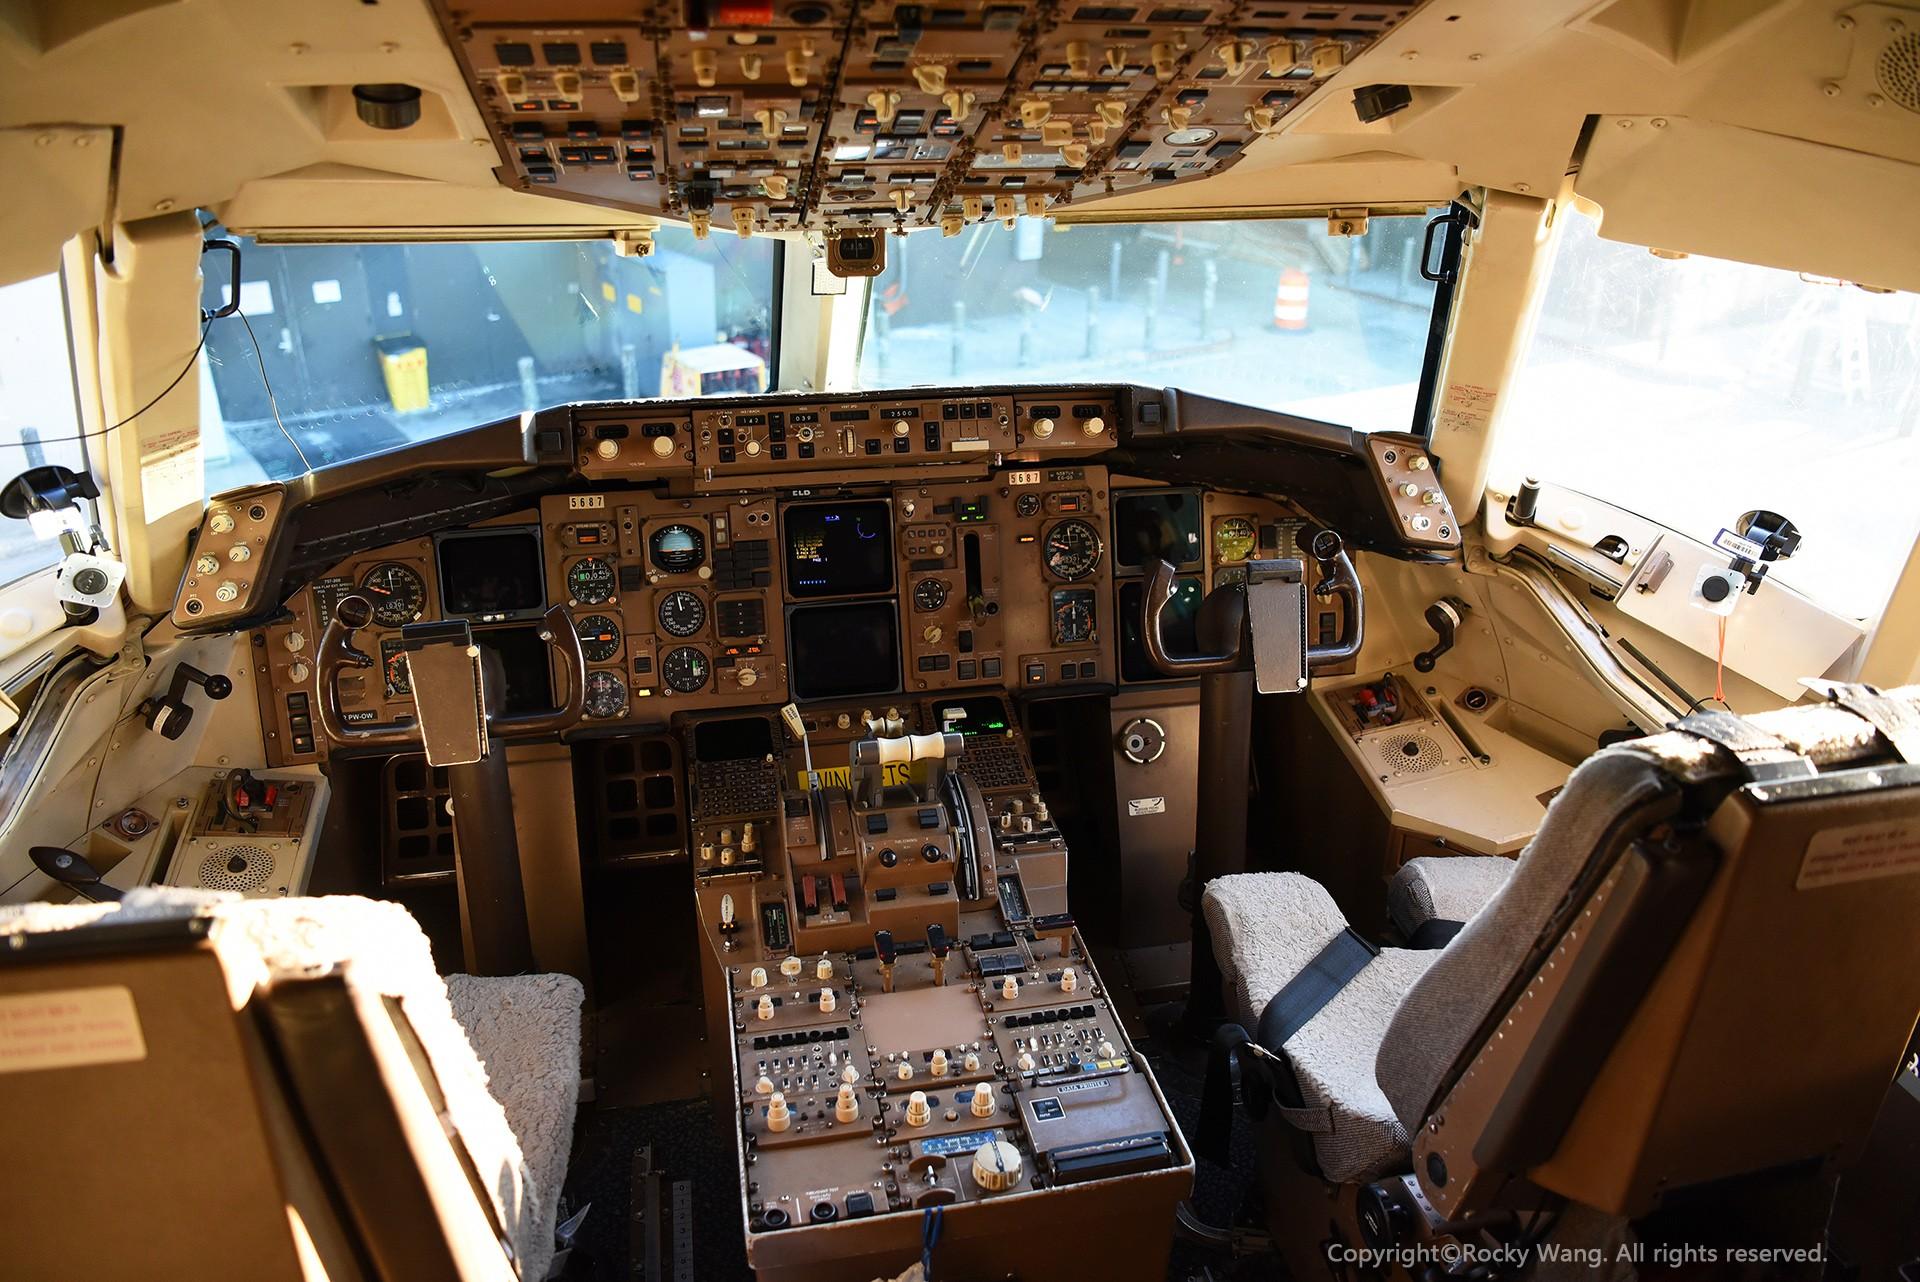 Re:[原创]简易版游记,纪念一次30段的环球飞行和一些碎碎念 BOEING 757-222 N587UA Newark Int'l Airport